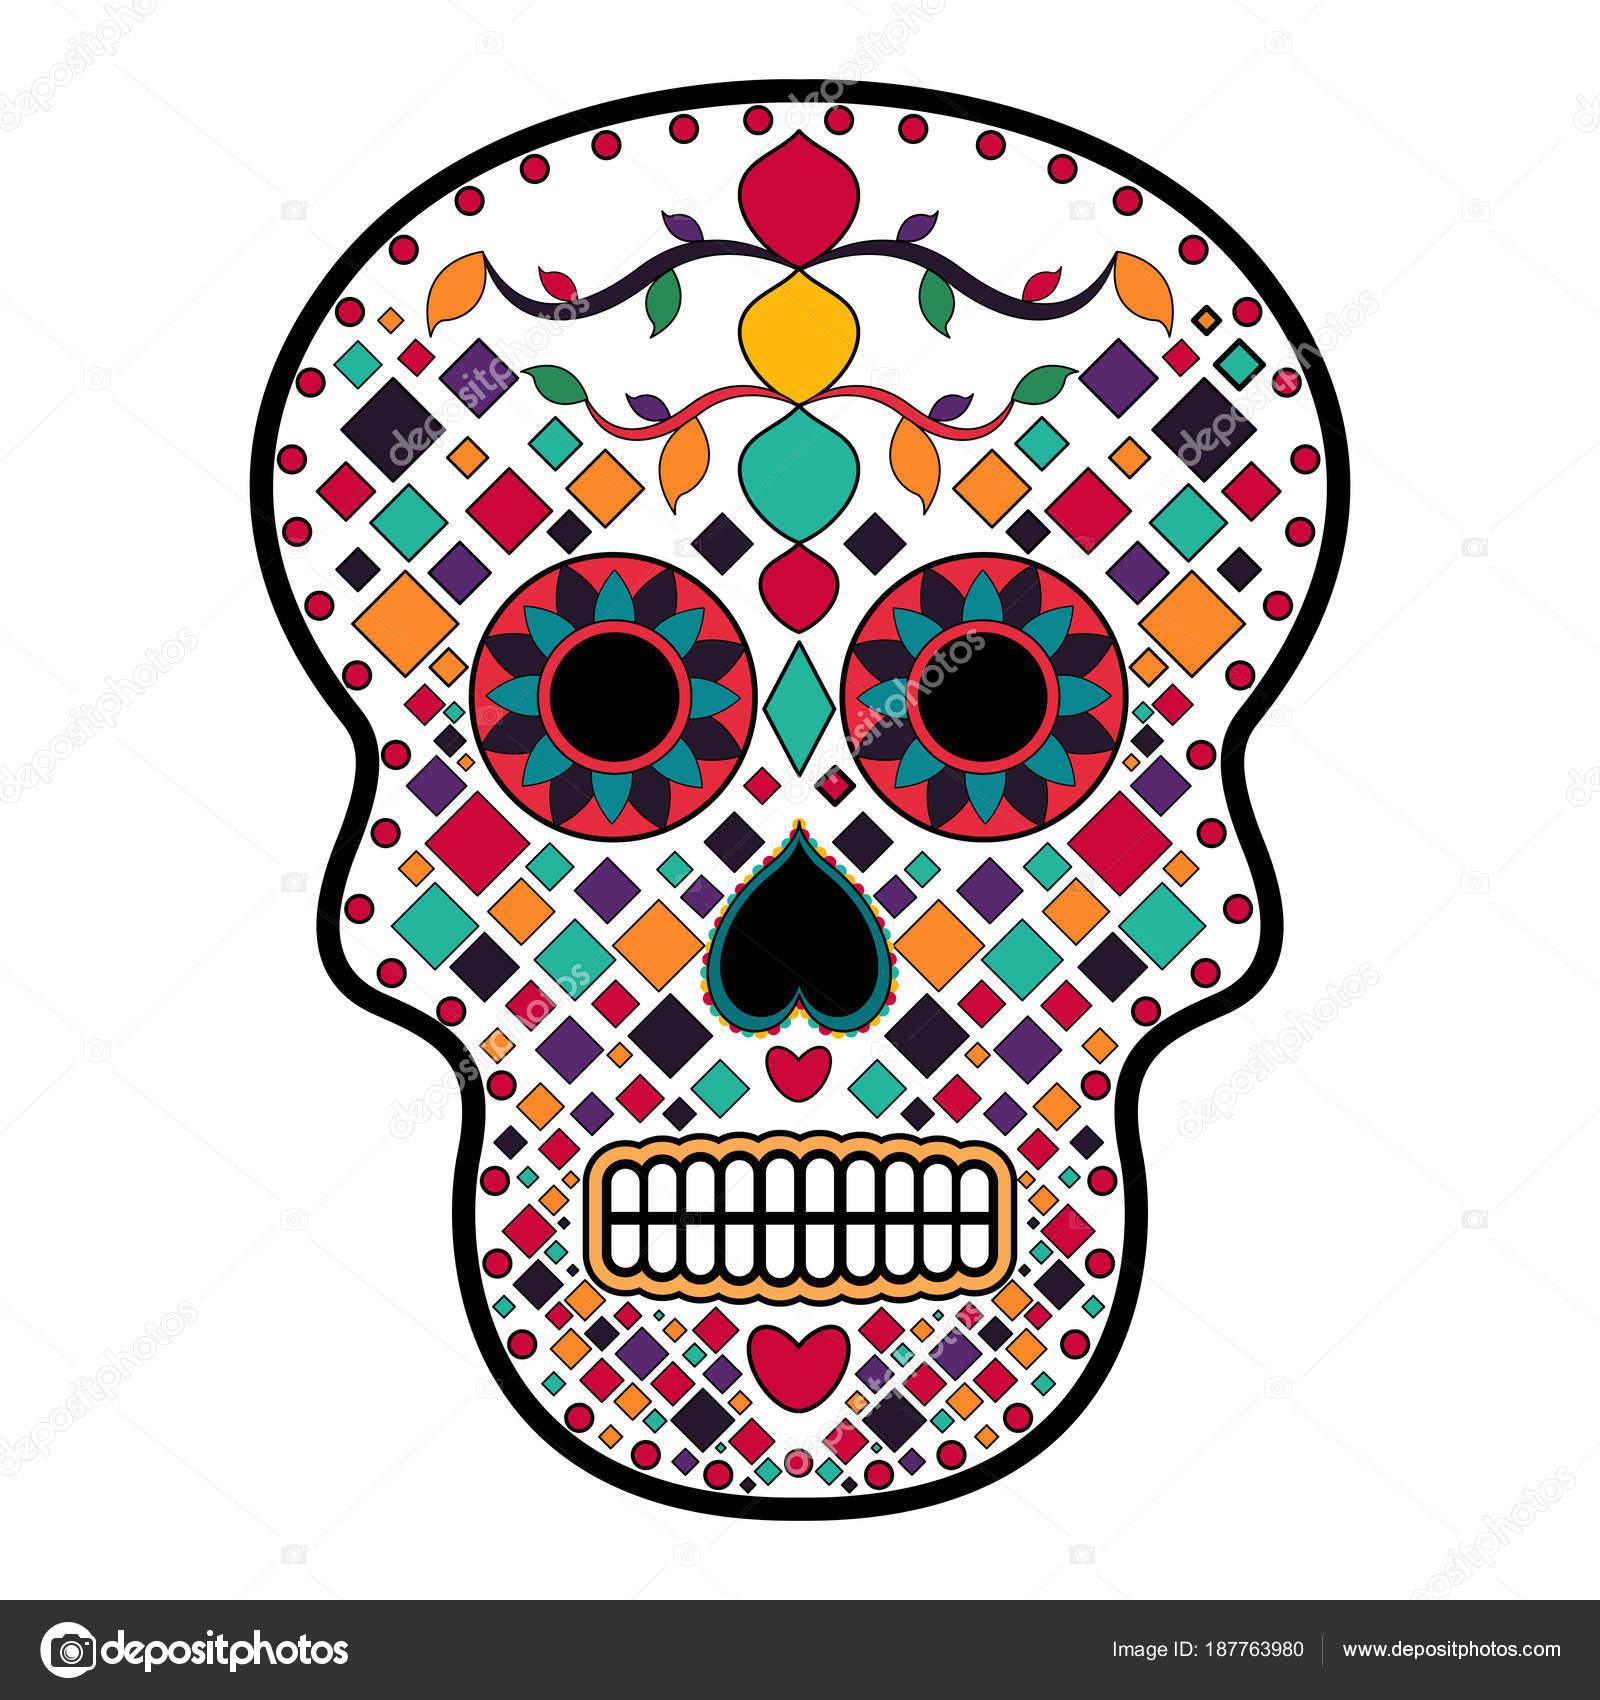 Cara De Calavera Decorada Cráneo De Cabeza Floral Ornamente Día